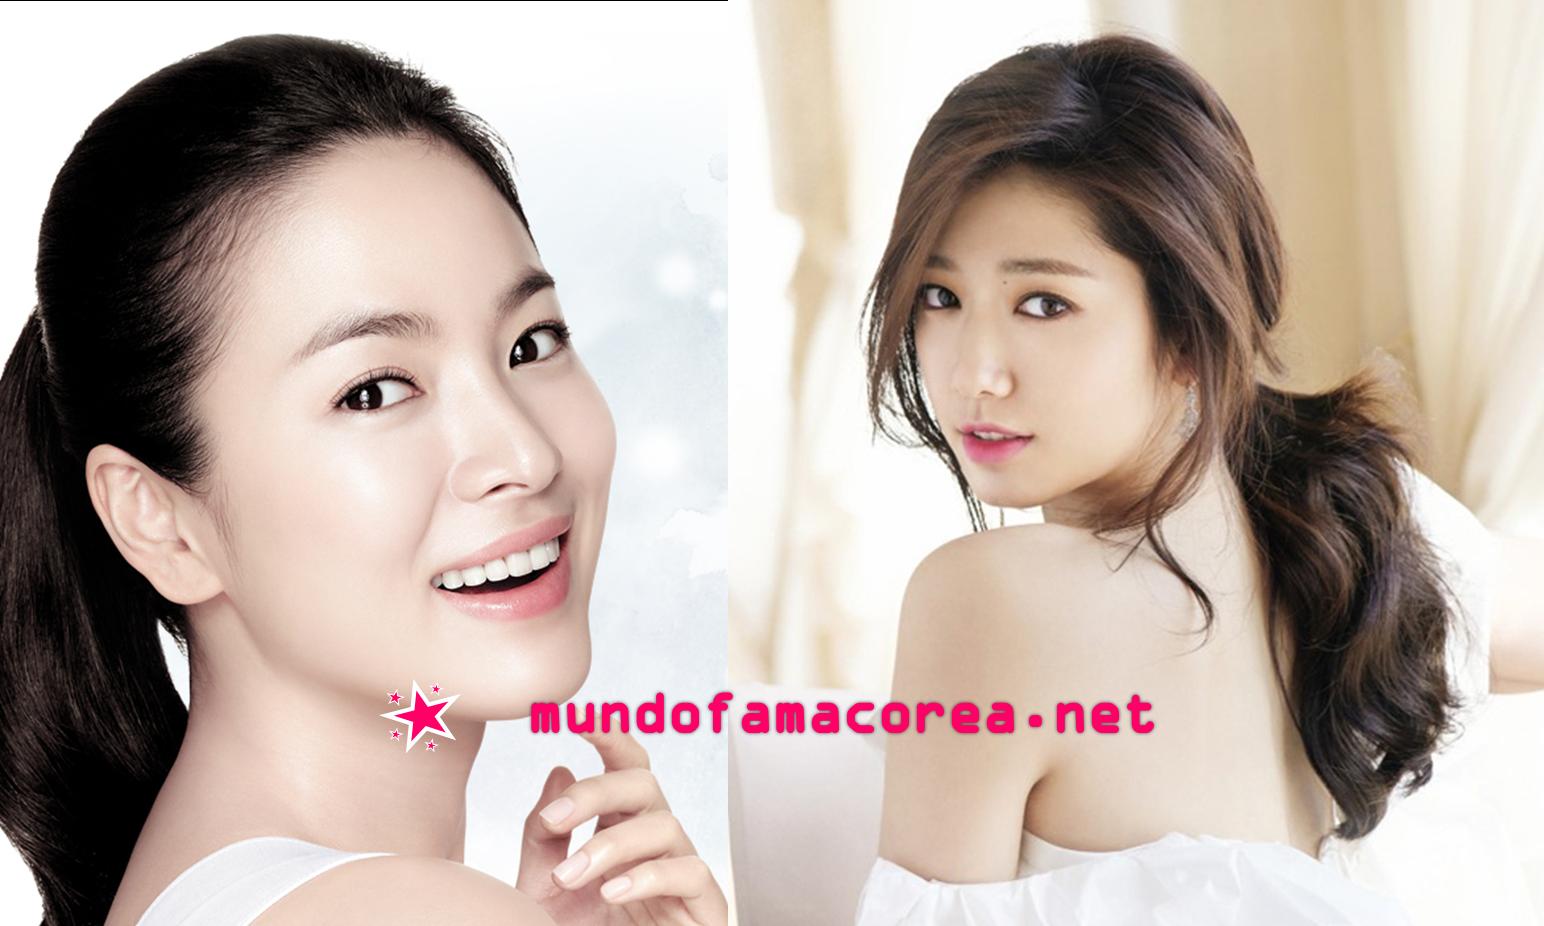 Actrices Coreanas famosas coreanas criticadas por estar subidas de peso